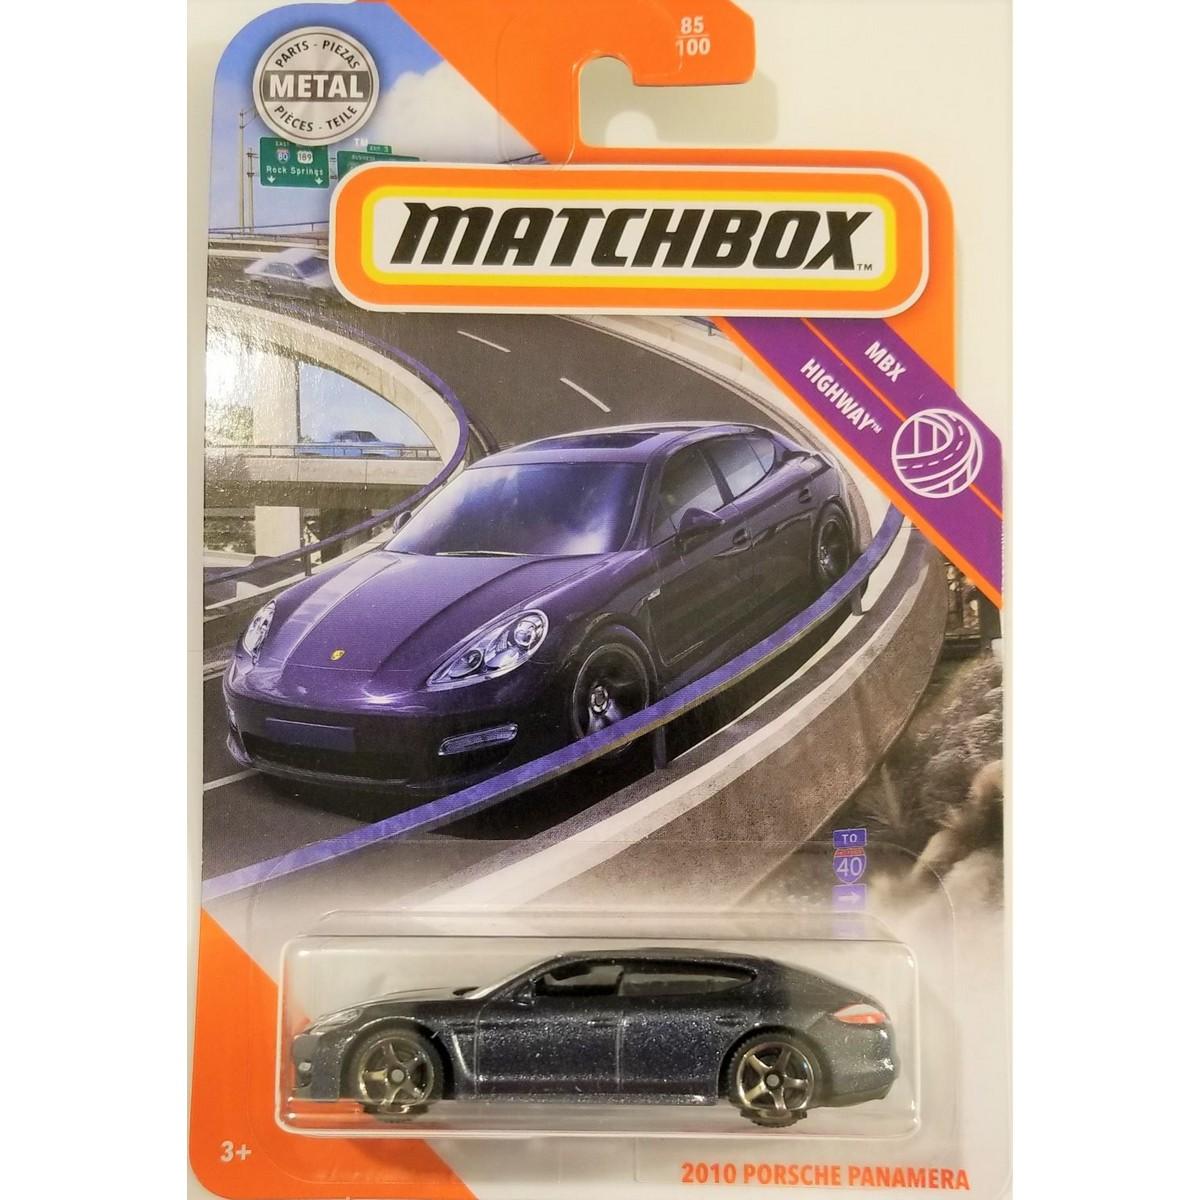 Matchbox 2010 Porsche Panamera - 1/64 scale diecast model